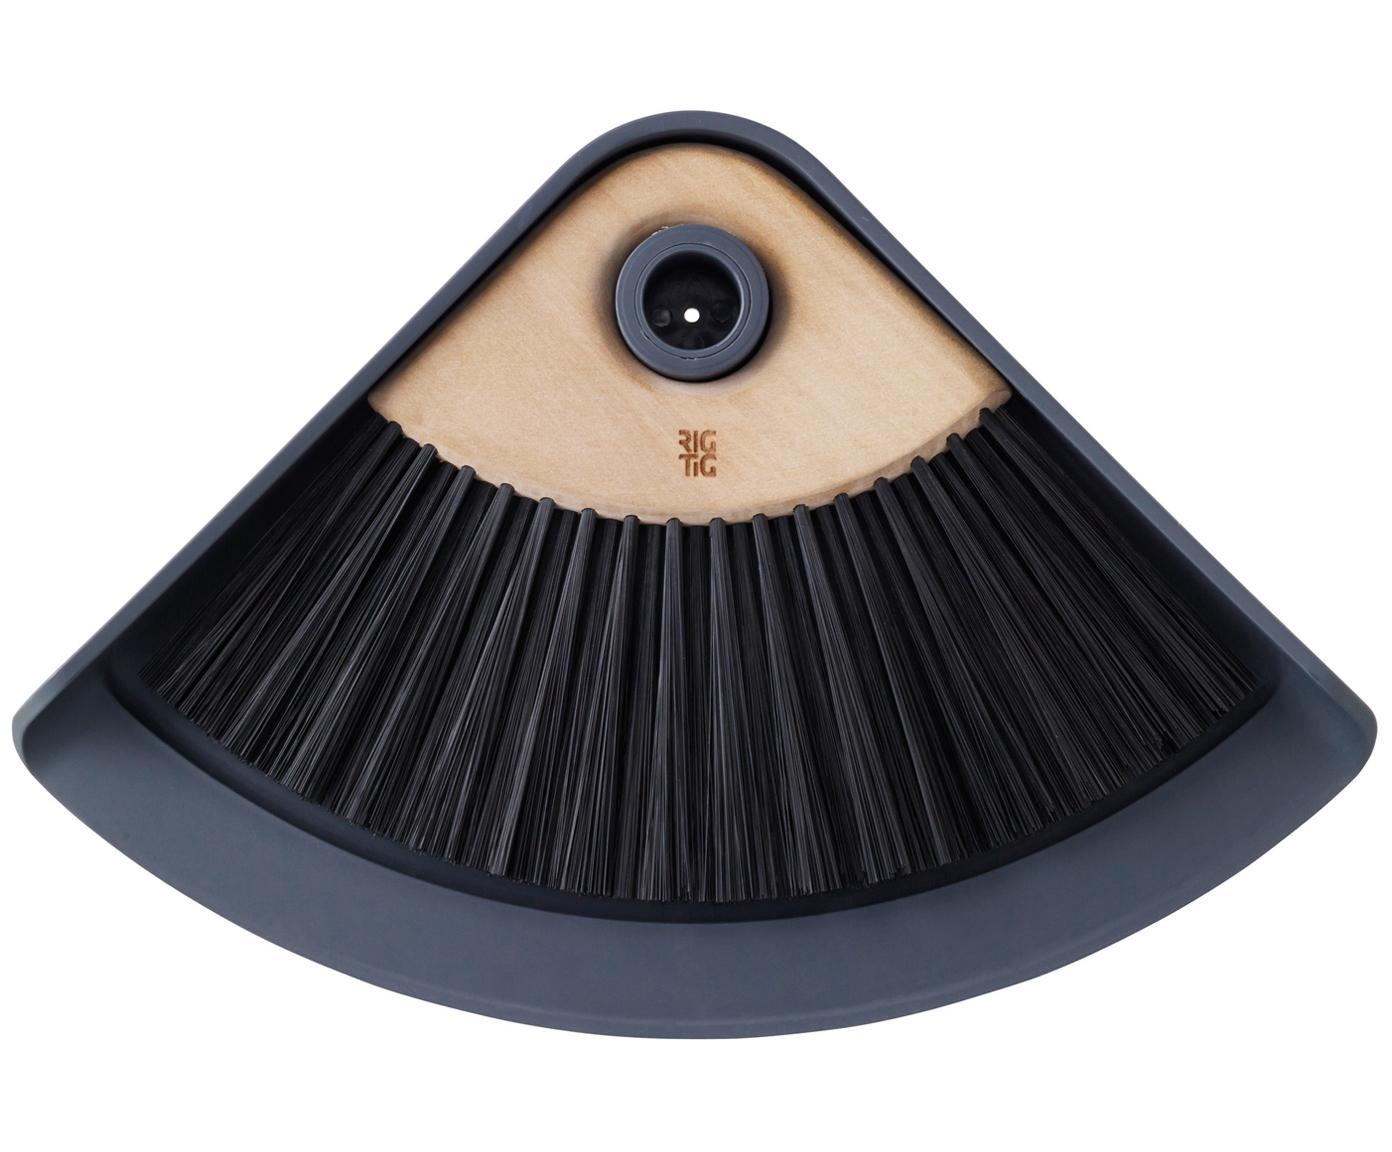 Handfeger und Kehrschaufel Sweep-It, Kunststoff, Lotusholz, Kehrschaufel: Grau<br>Borsten Handfeger: Schwarz, Griff Handfeger: Braun, 20 x 28 cm